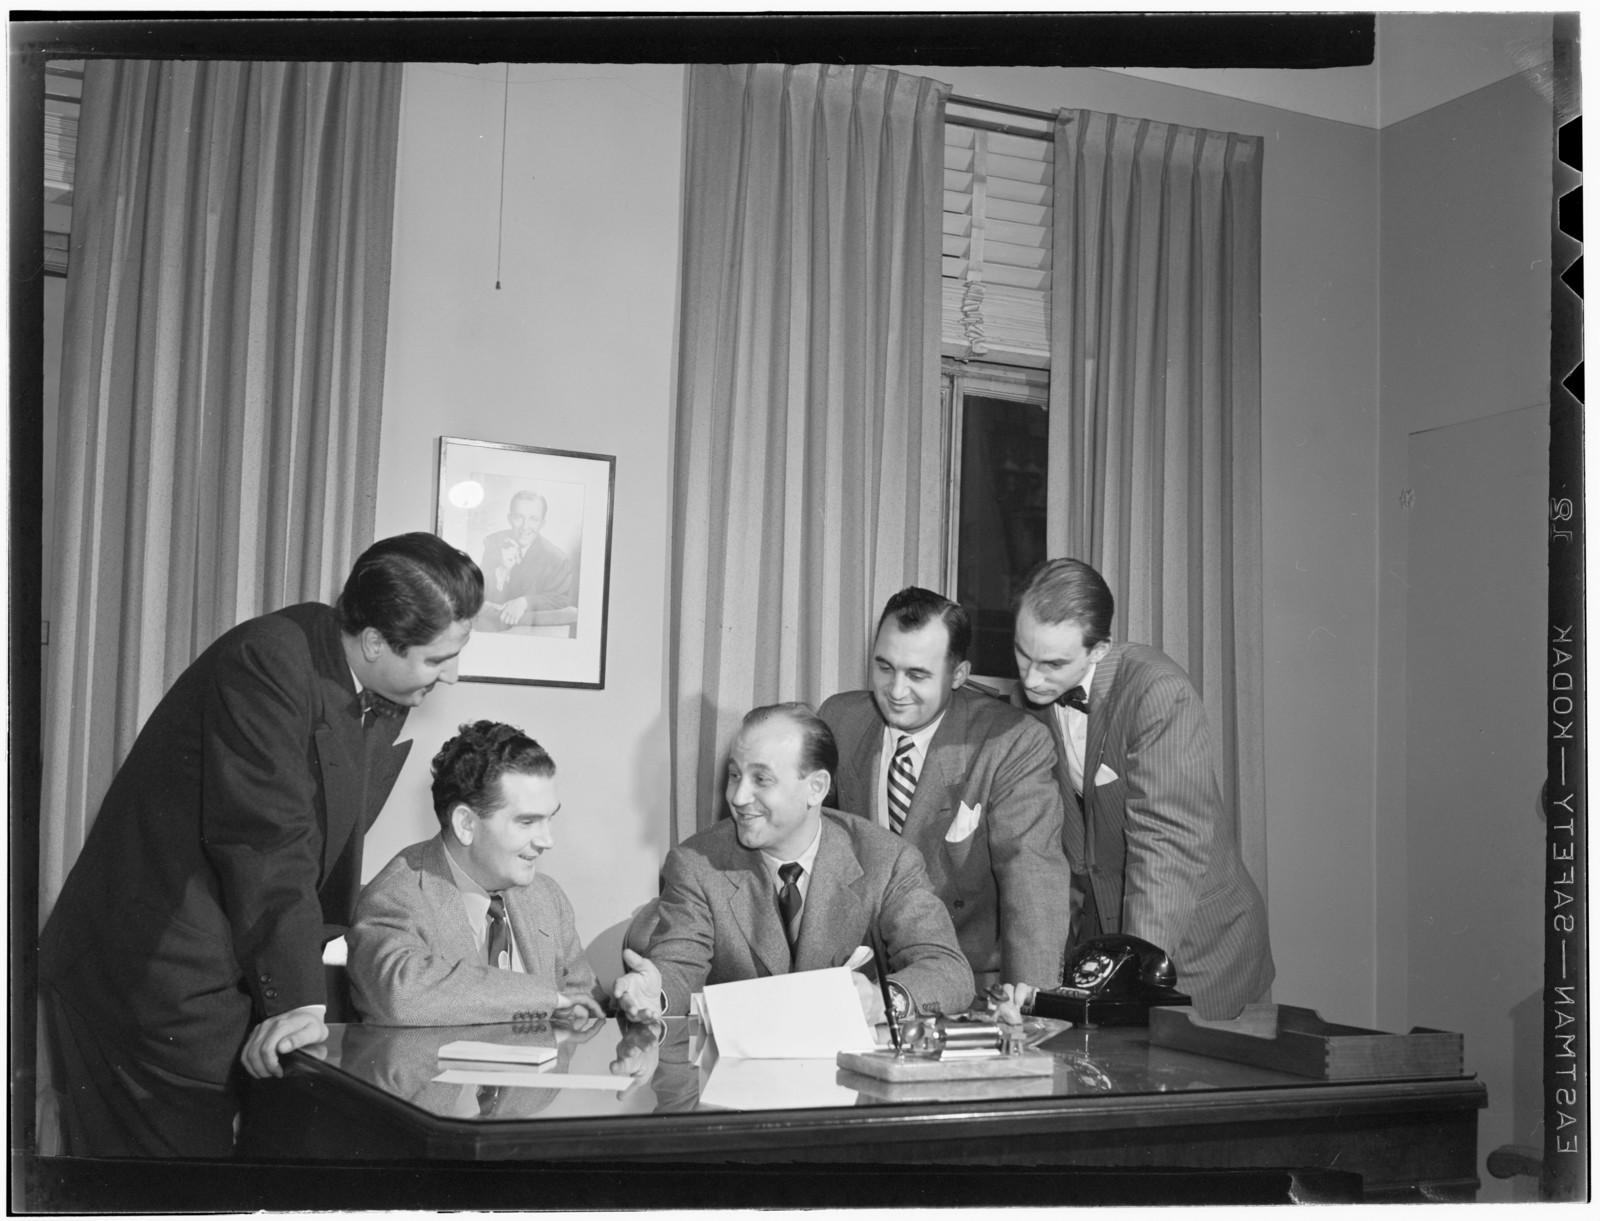 [Portrait of Joe Mooney and Milt Gabler(?), Decca office(?), New York, N.Y., ca. Dec. 1946]